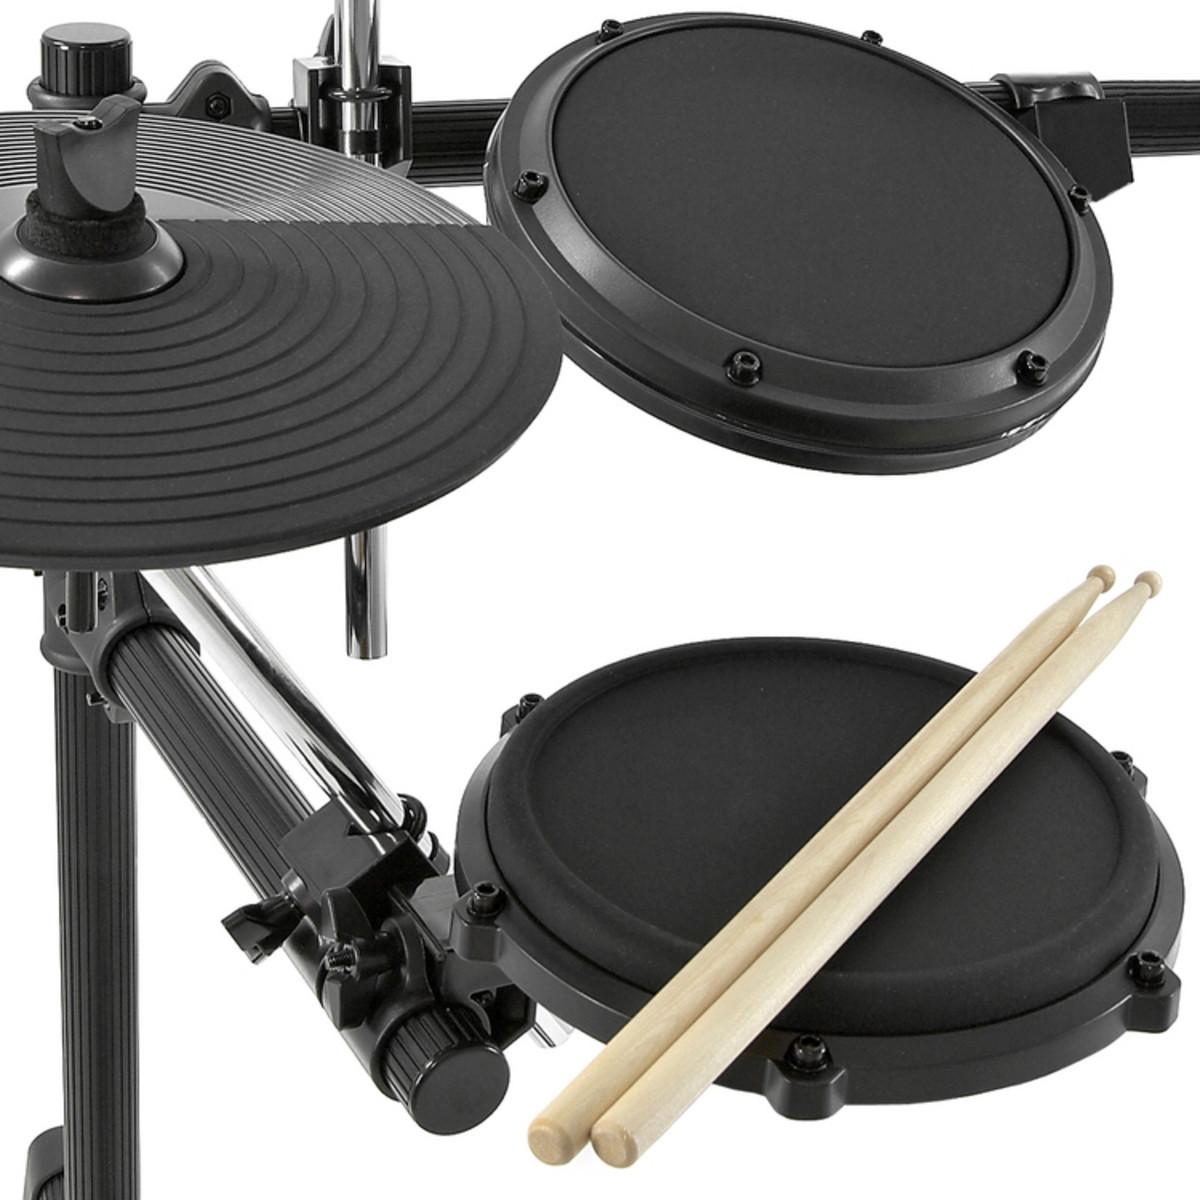 alesis dm6 usb express electronic drum kit christmas amp pack at gear4music. Black Bedroom Furniture Sets. Home Design Ideas